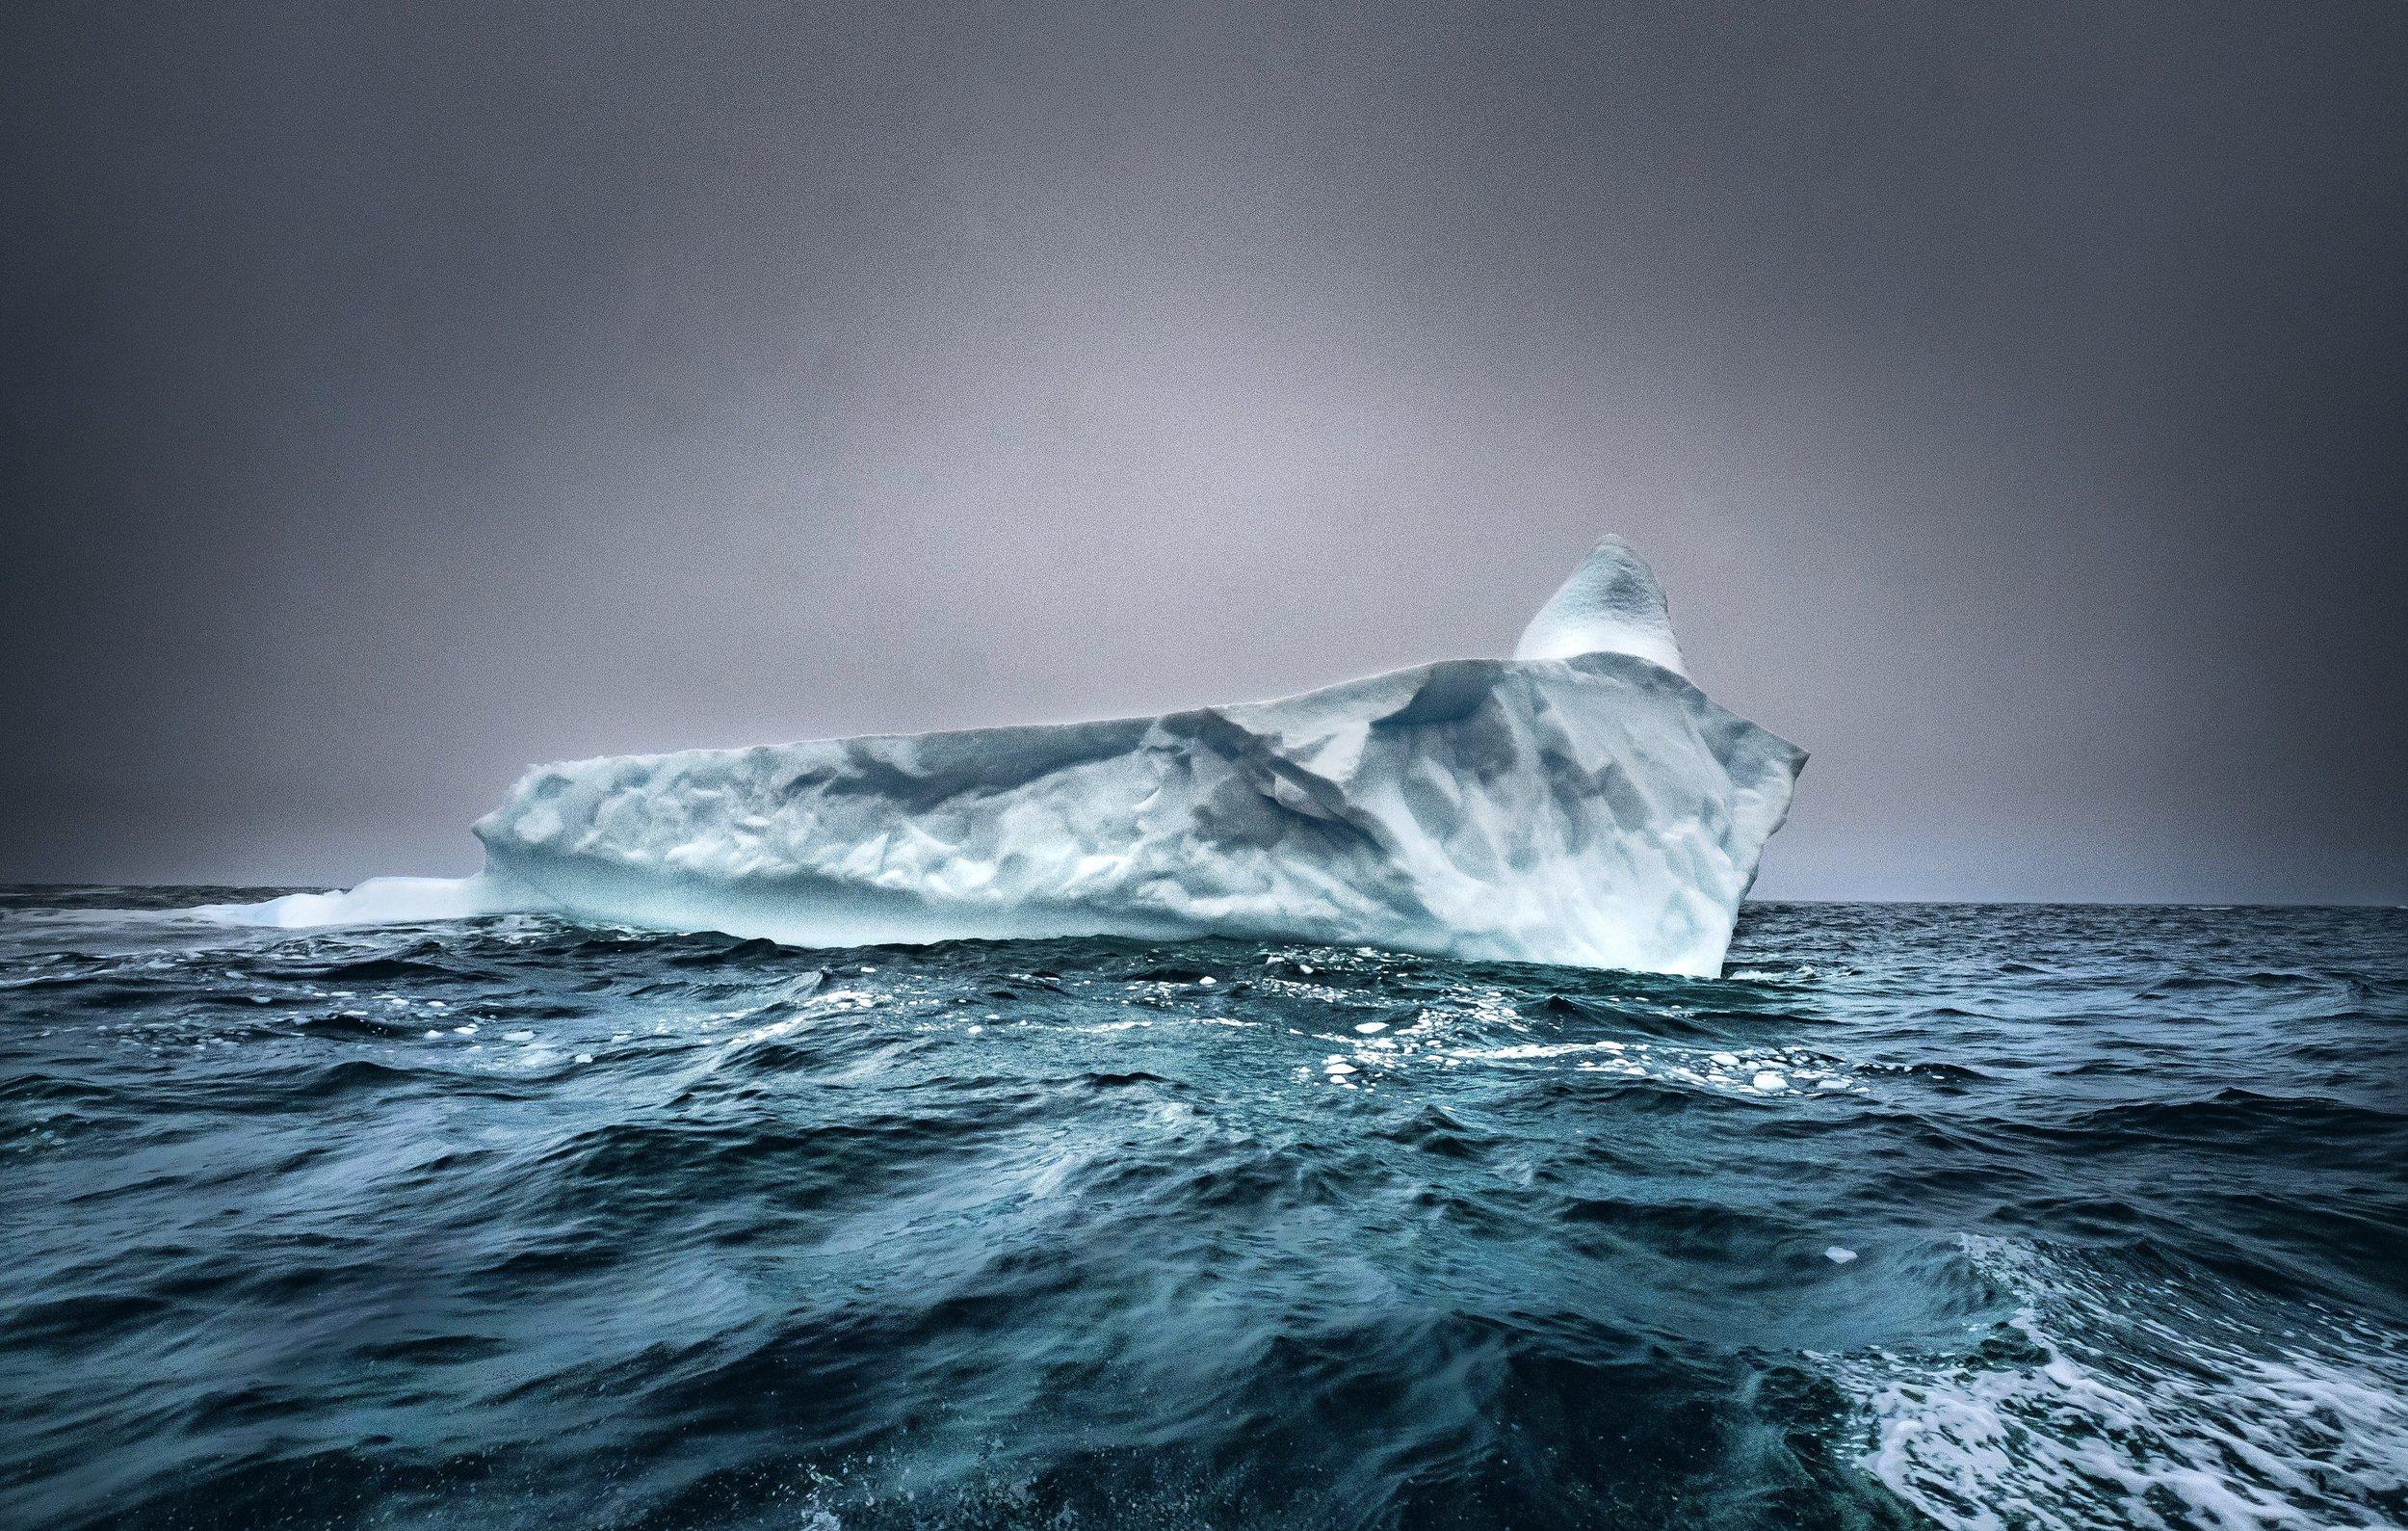 Iceberg off the cost of Newfoundland